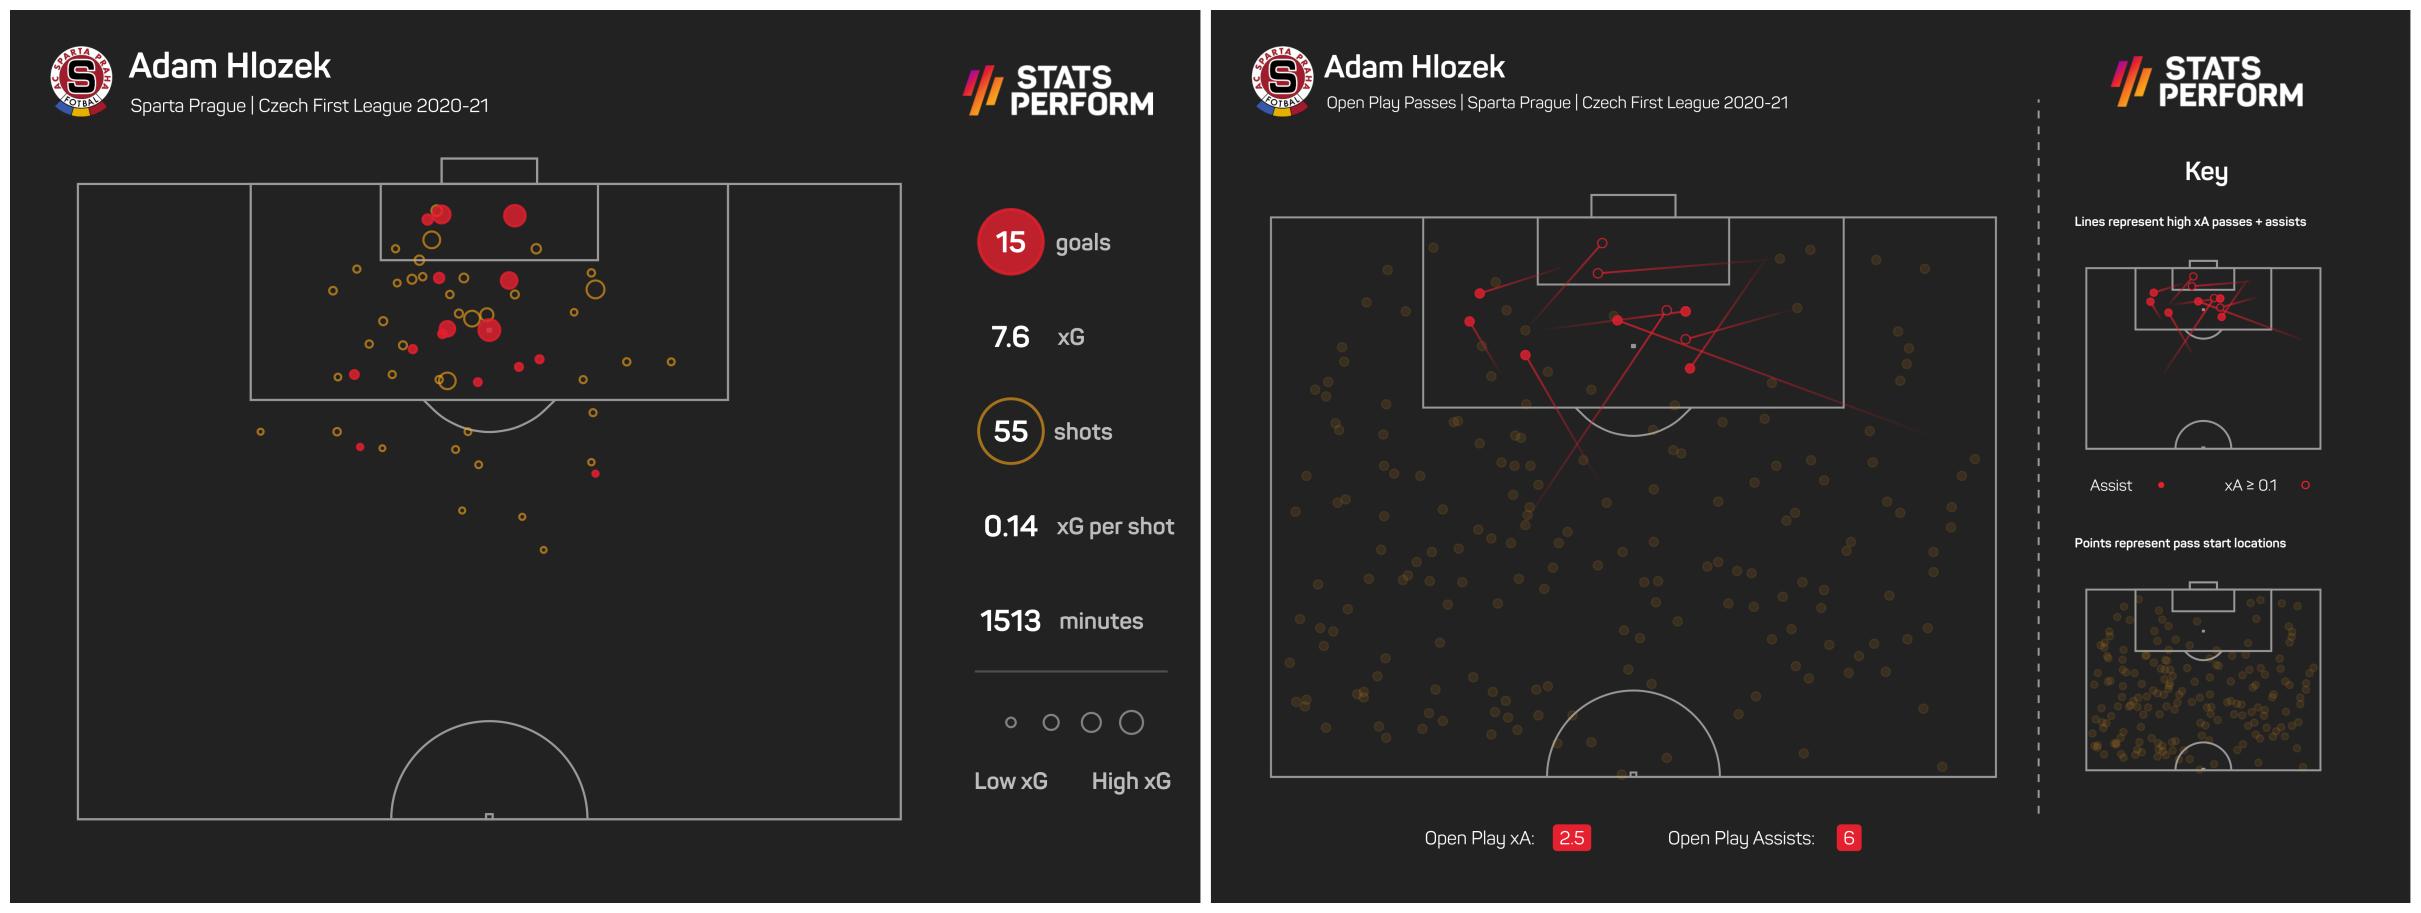 Adam Hlozek enjoyed a remarkable 2020-21 for Sparta Prague